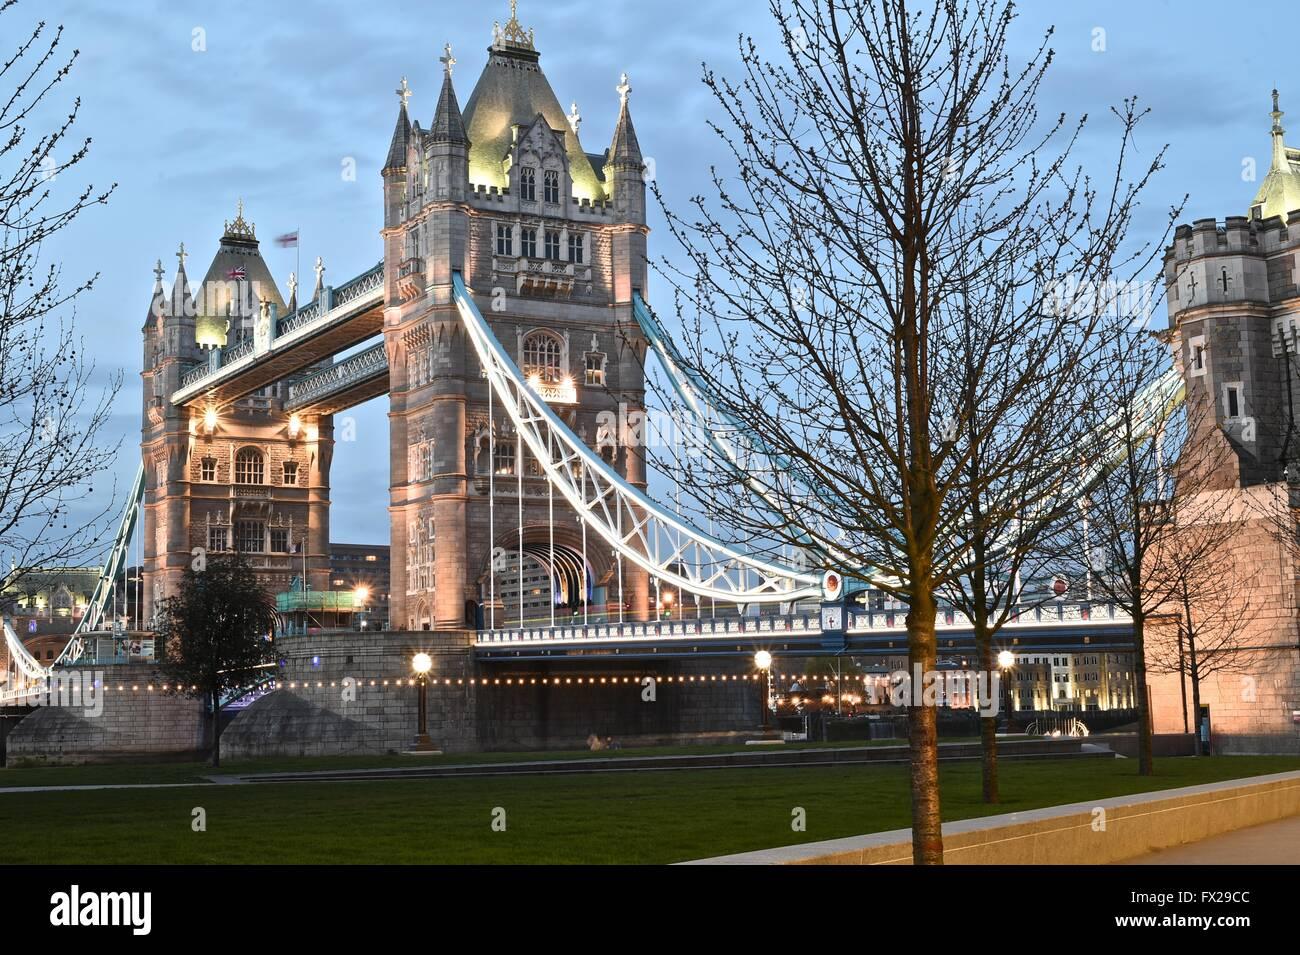 Side shot of Tower Bridge - Stock Image